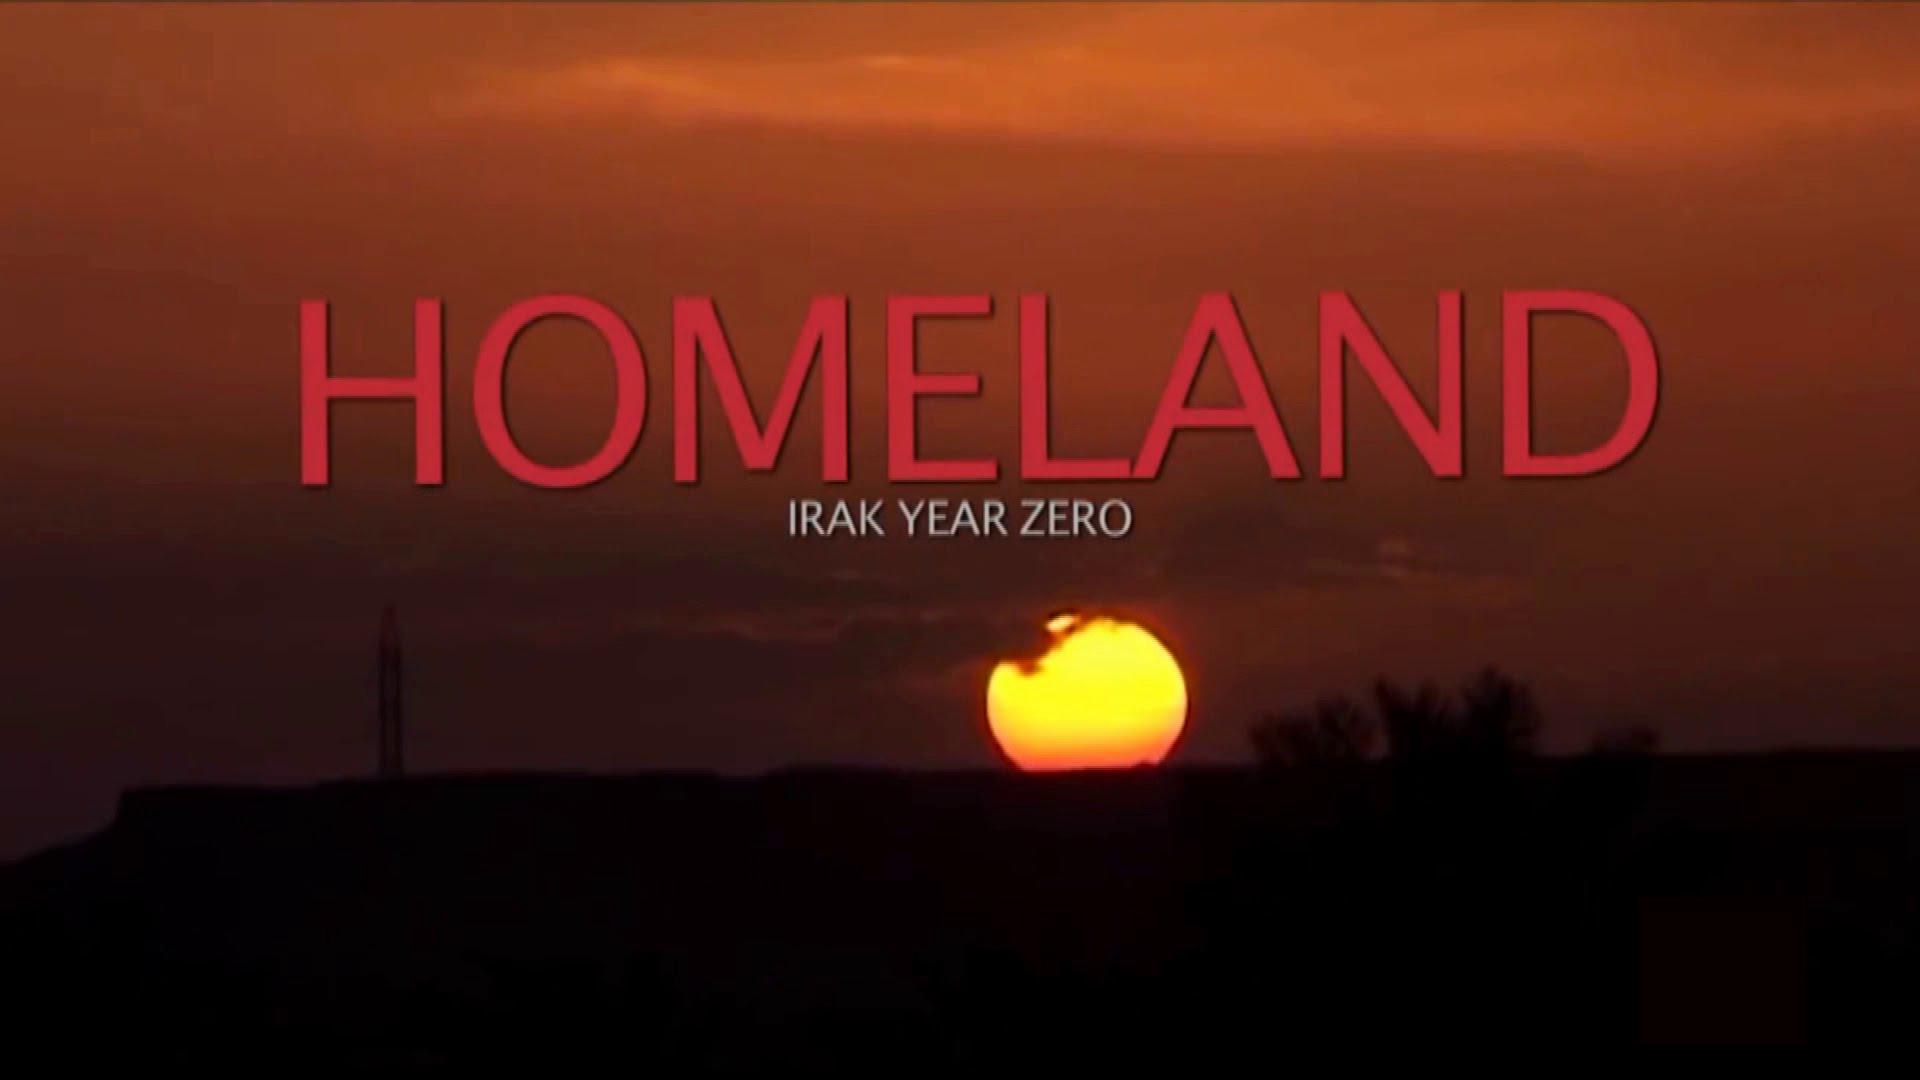 homeland couverture